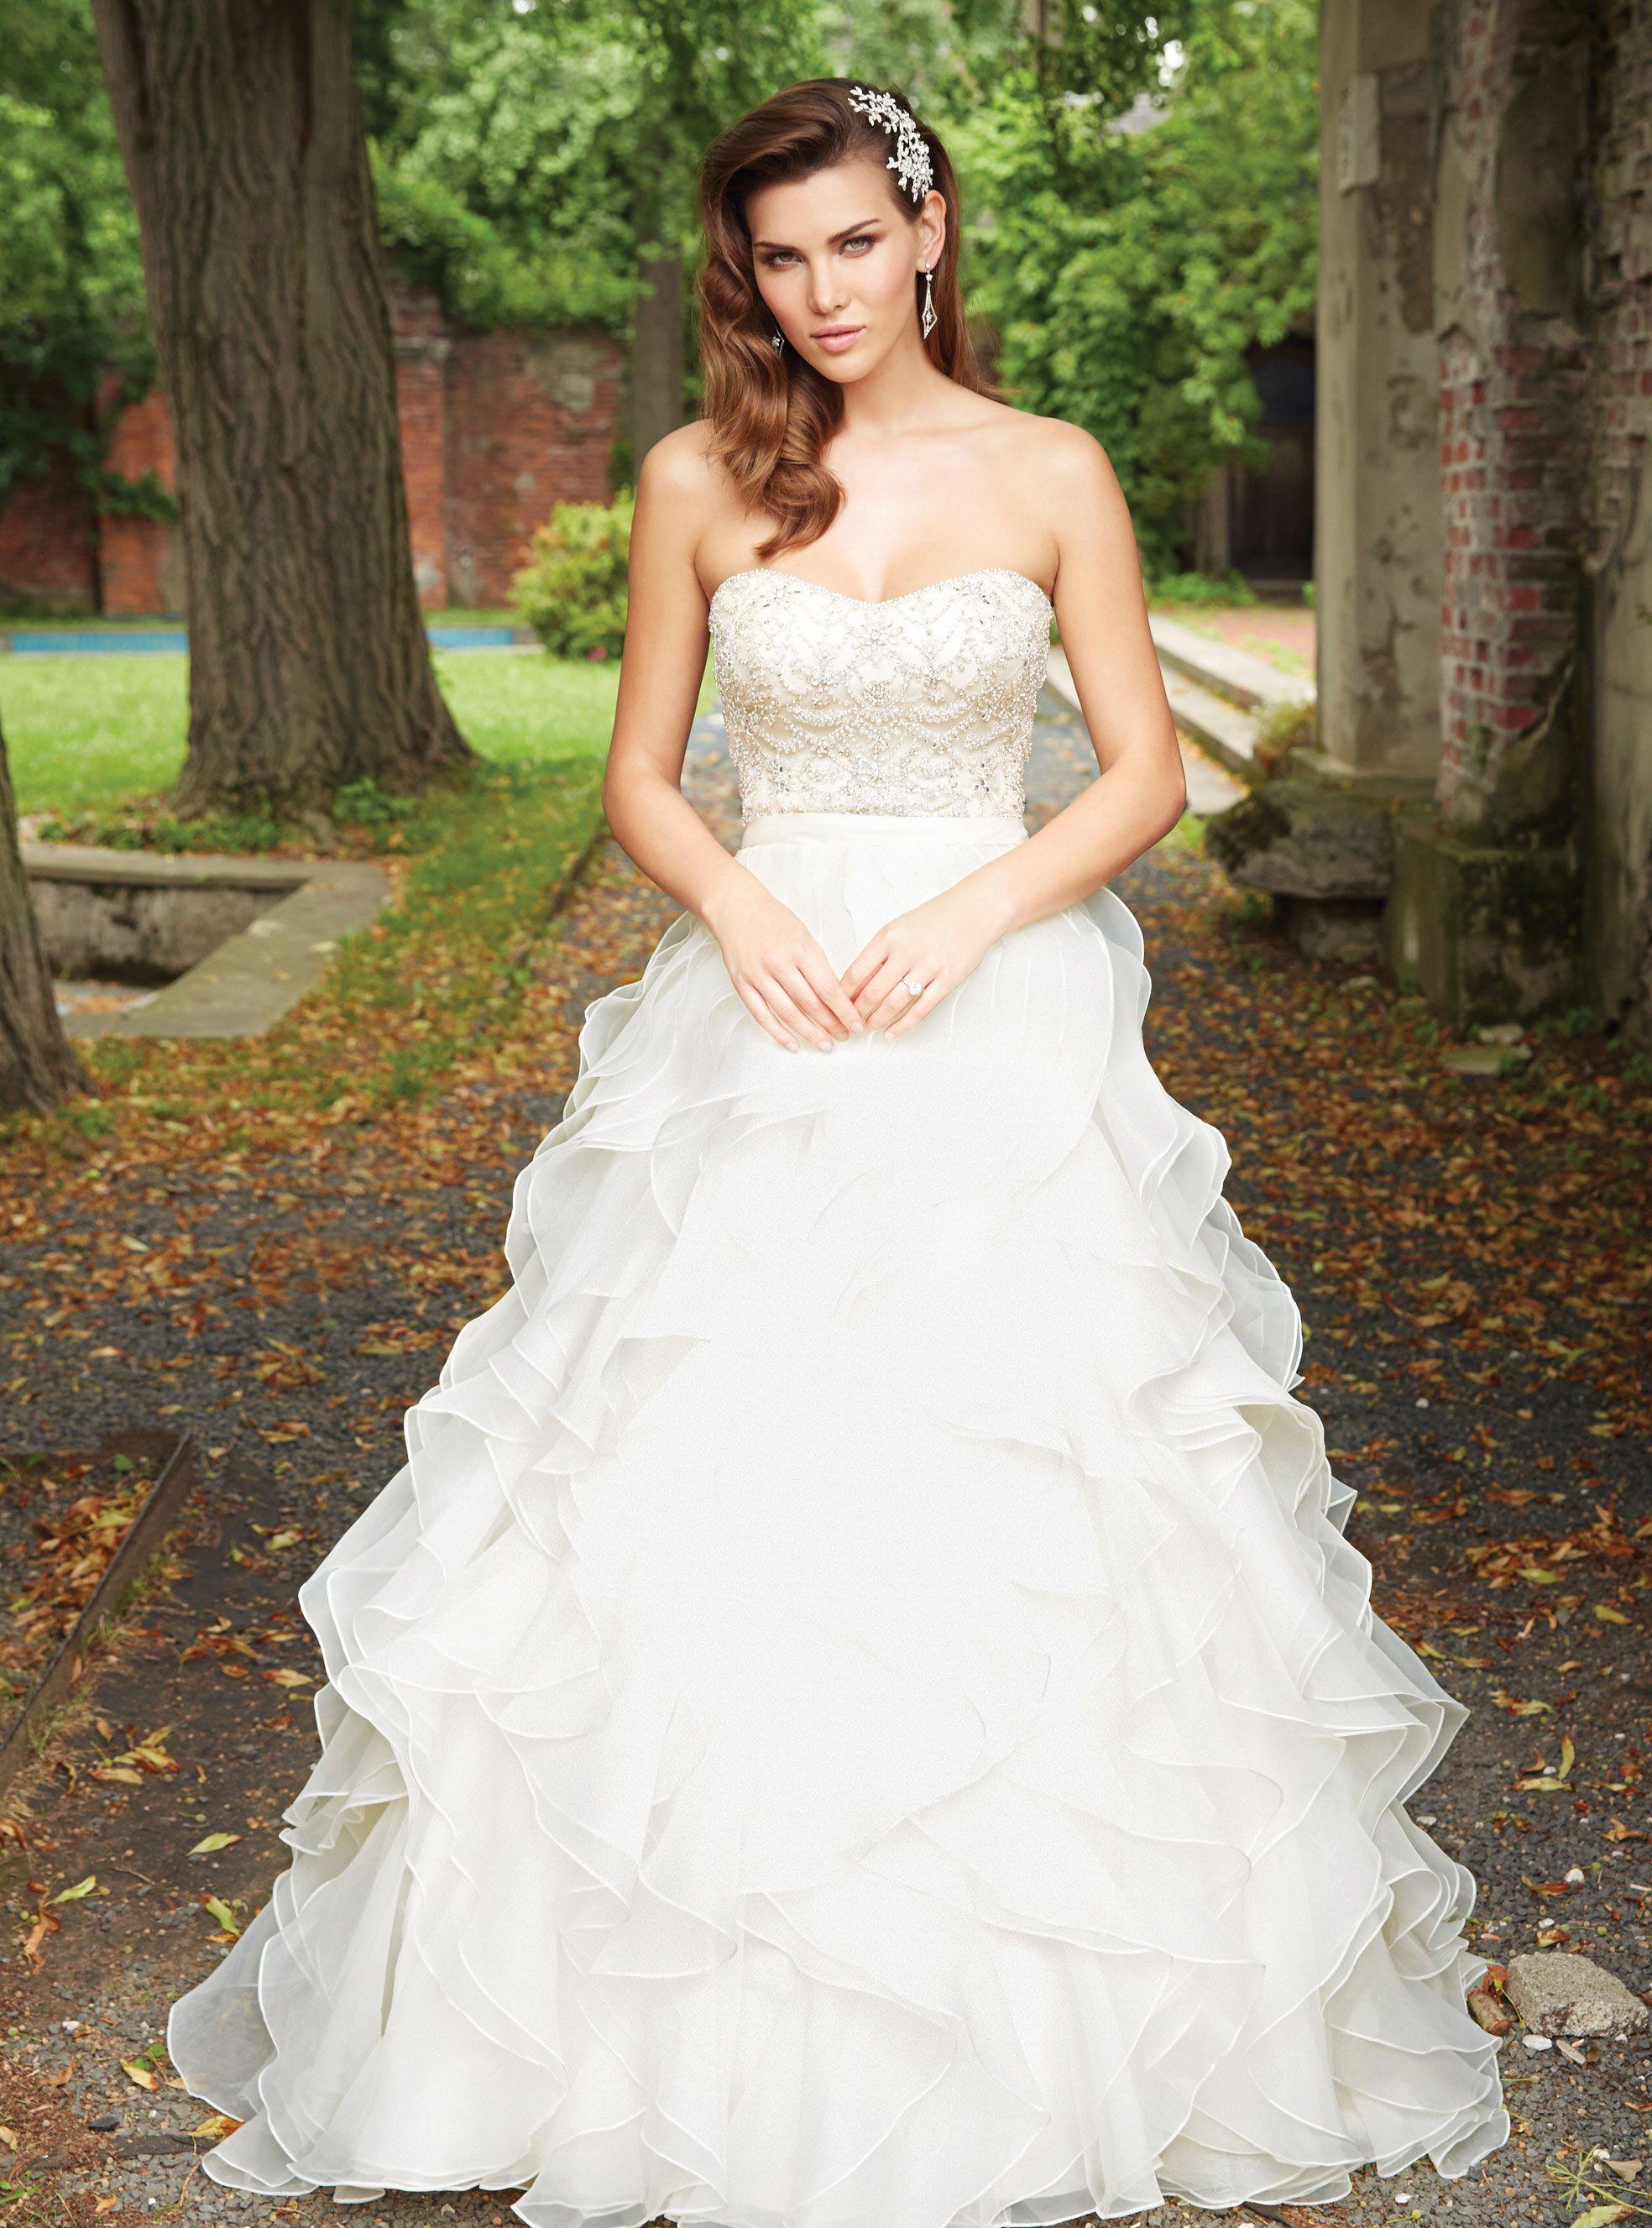 Strapless wedding gown i strapless bridal gown i summer wedding